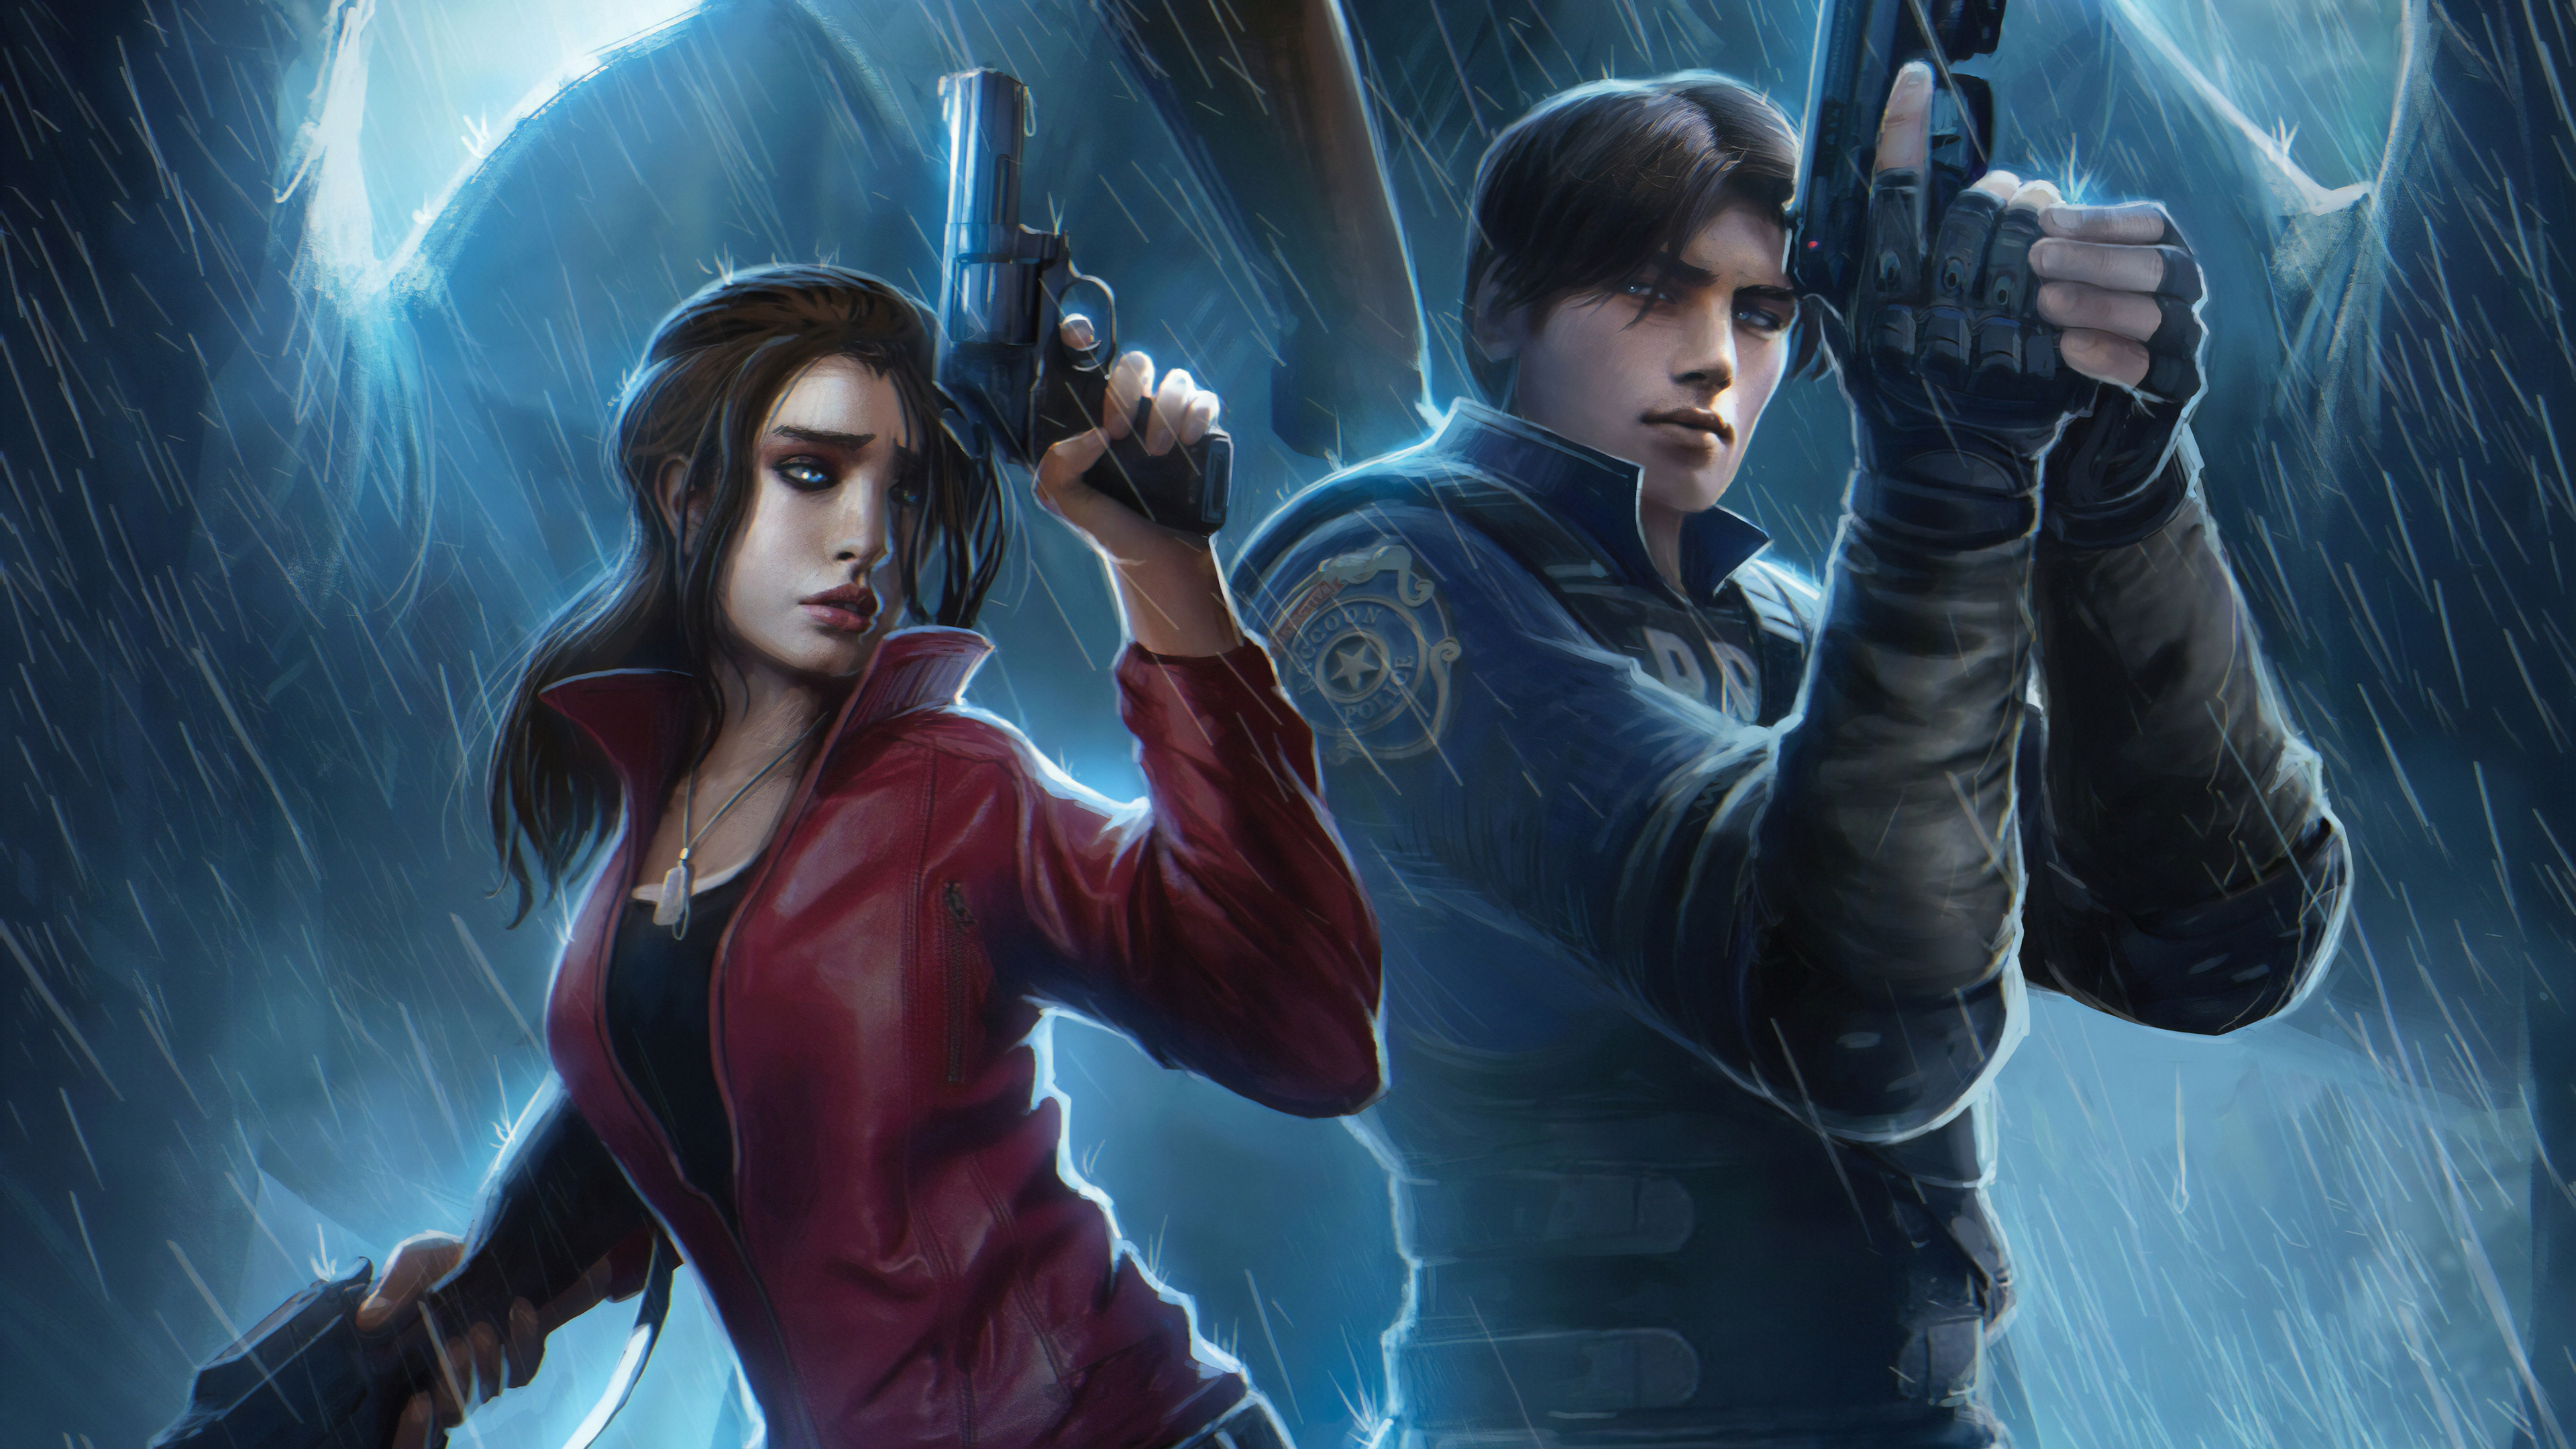 Resident Evil Claire Redfield Chris Redfield 4k Art Hd Games 4k